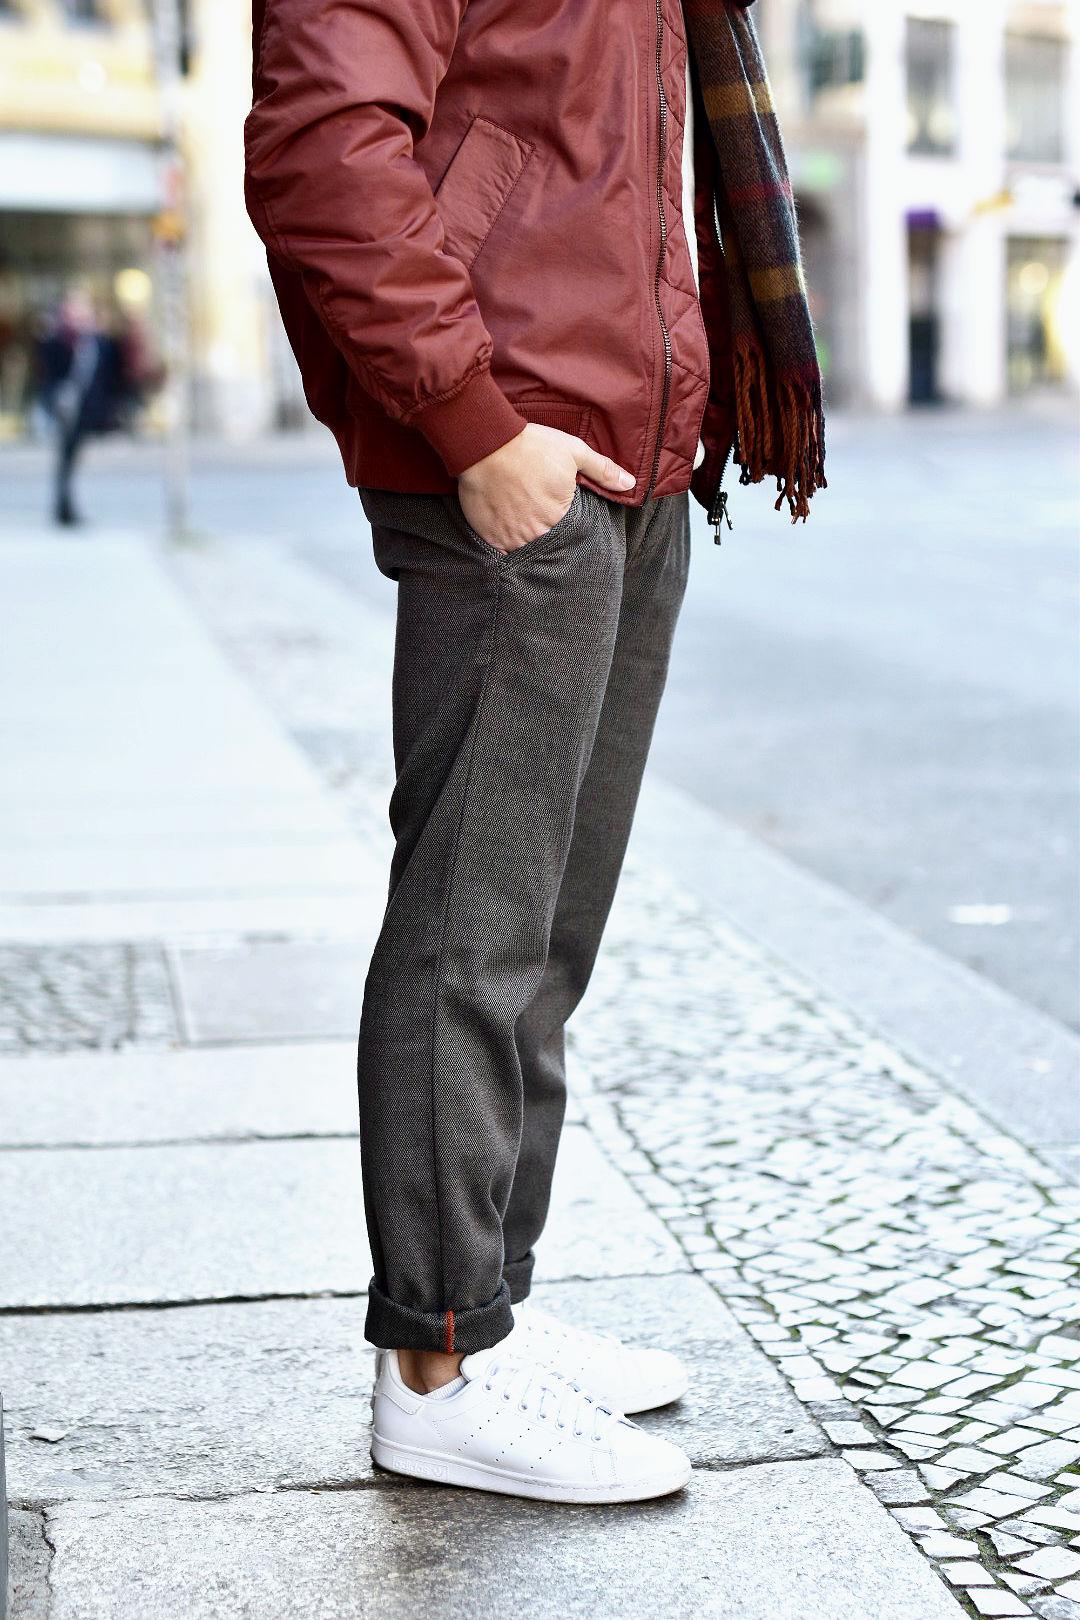 tommeezjerry-styleblog-maennerblog-maenner-modeblog-berlin-berlinblog-maennermodeblog-outfit-bomberjacke-alberto-pants-adidas-sneaker-schal-kariert-streetlook